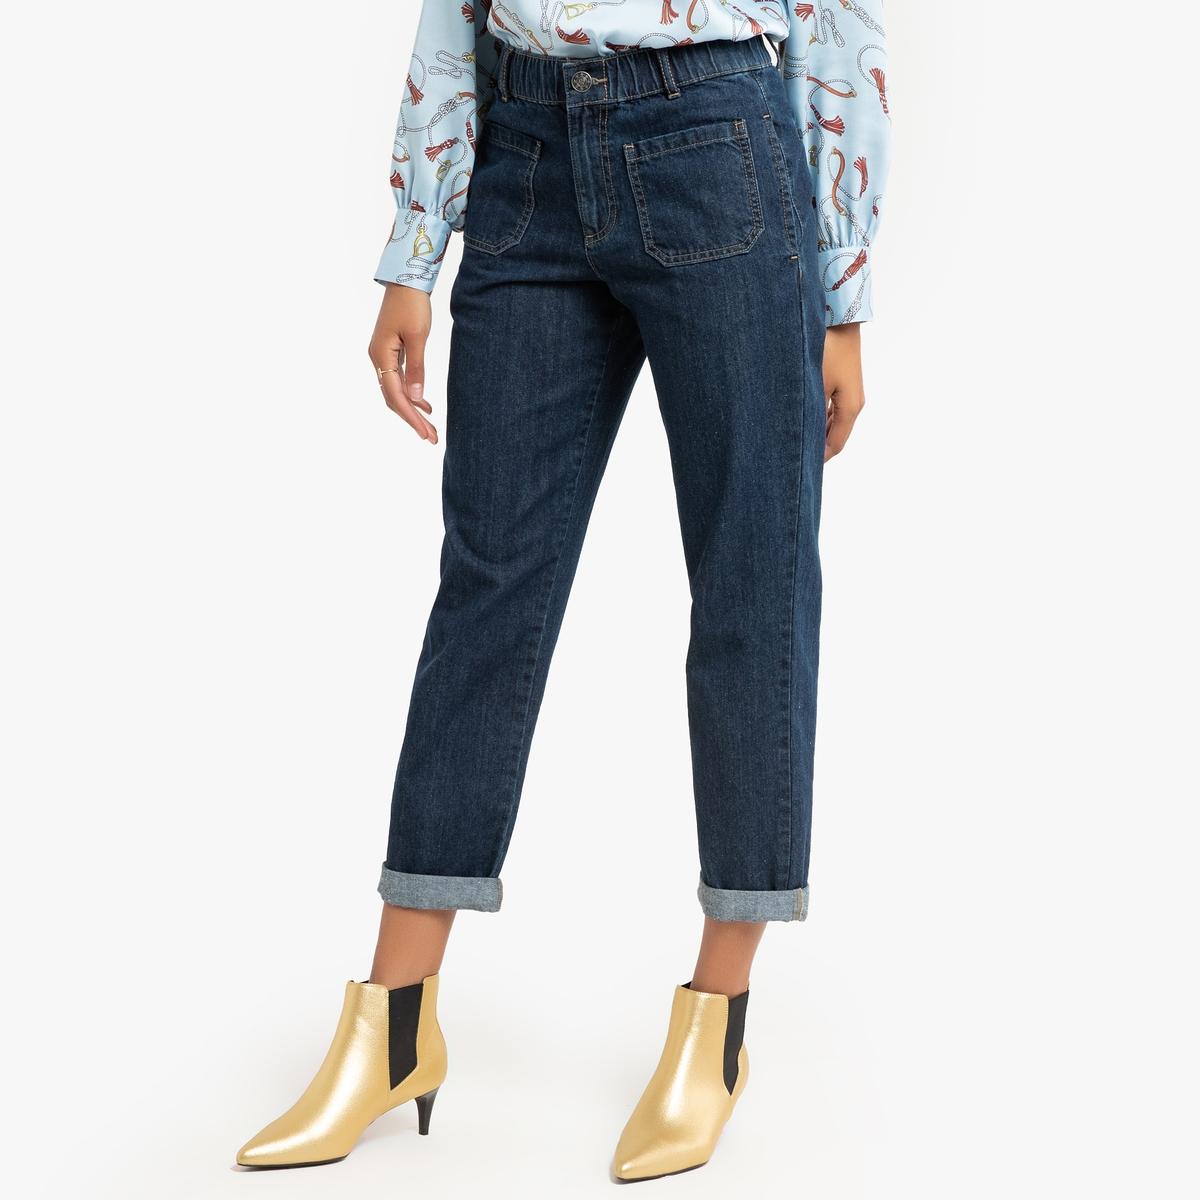 Джинсы-бойфренды La Redoute La Redoute 34 (FR) - 40 (RUS) синий джинсы bray steve alan джинсы бойфренды